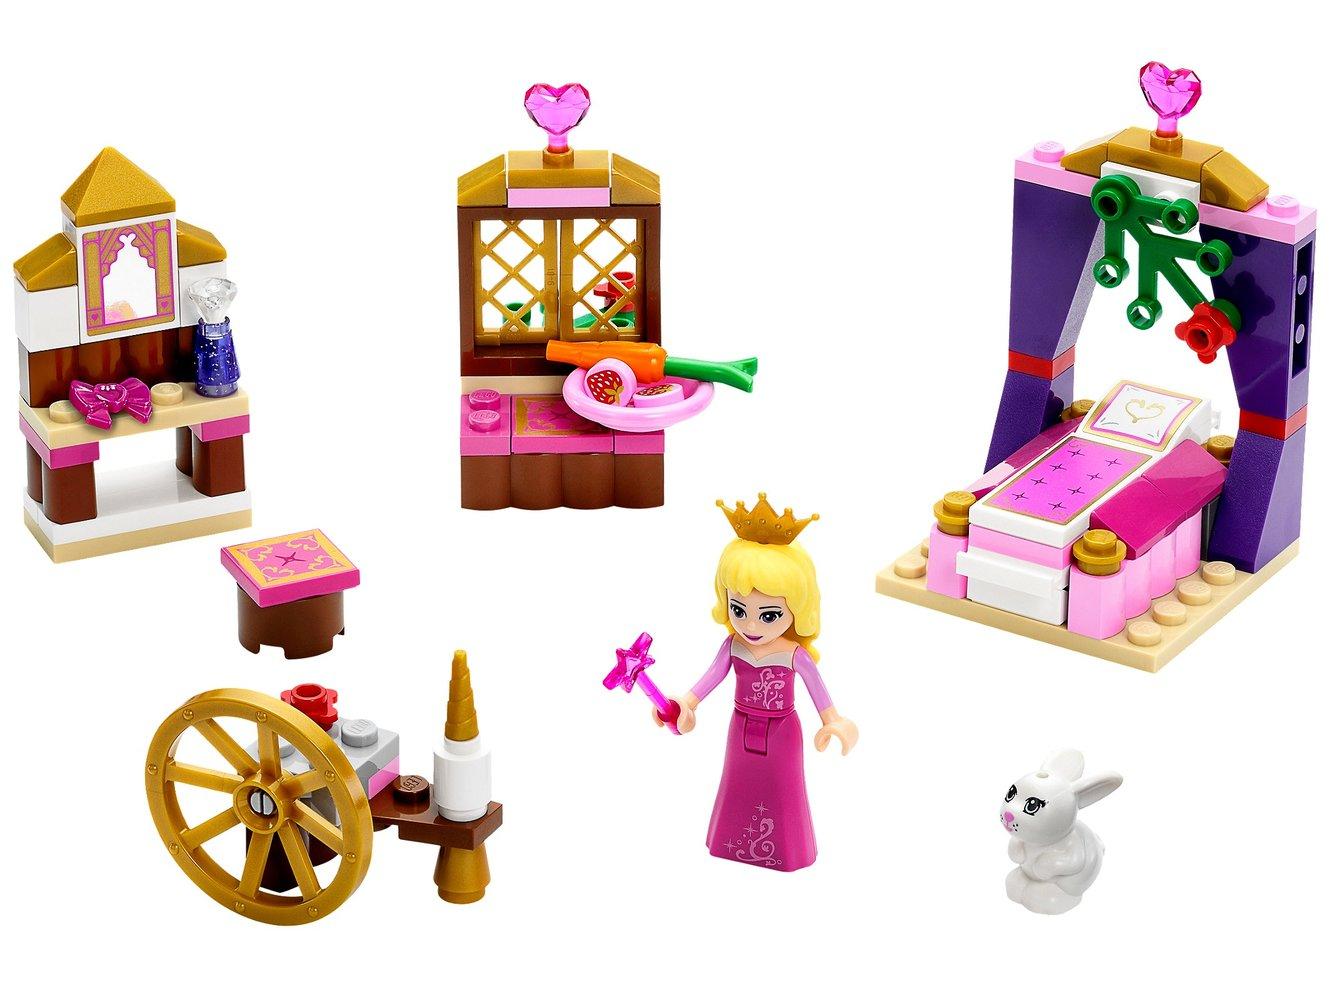 Sleeping Beauty's Royal Bedroom